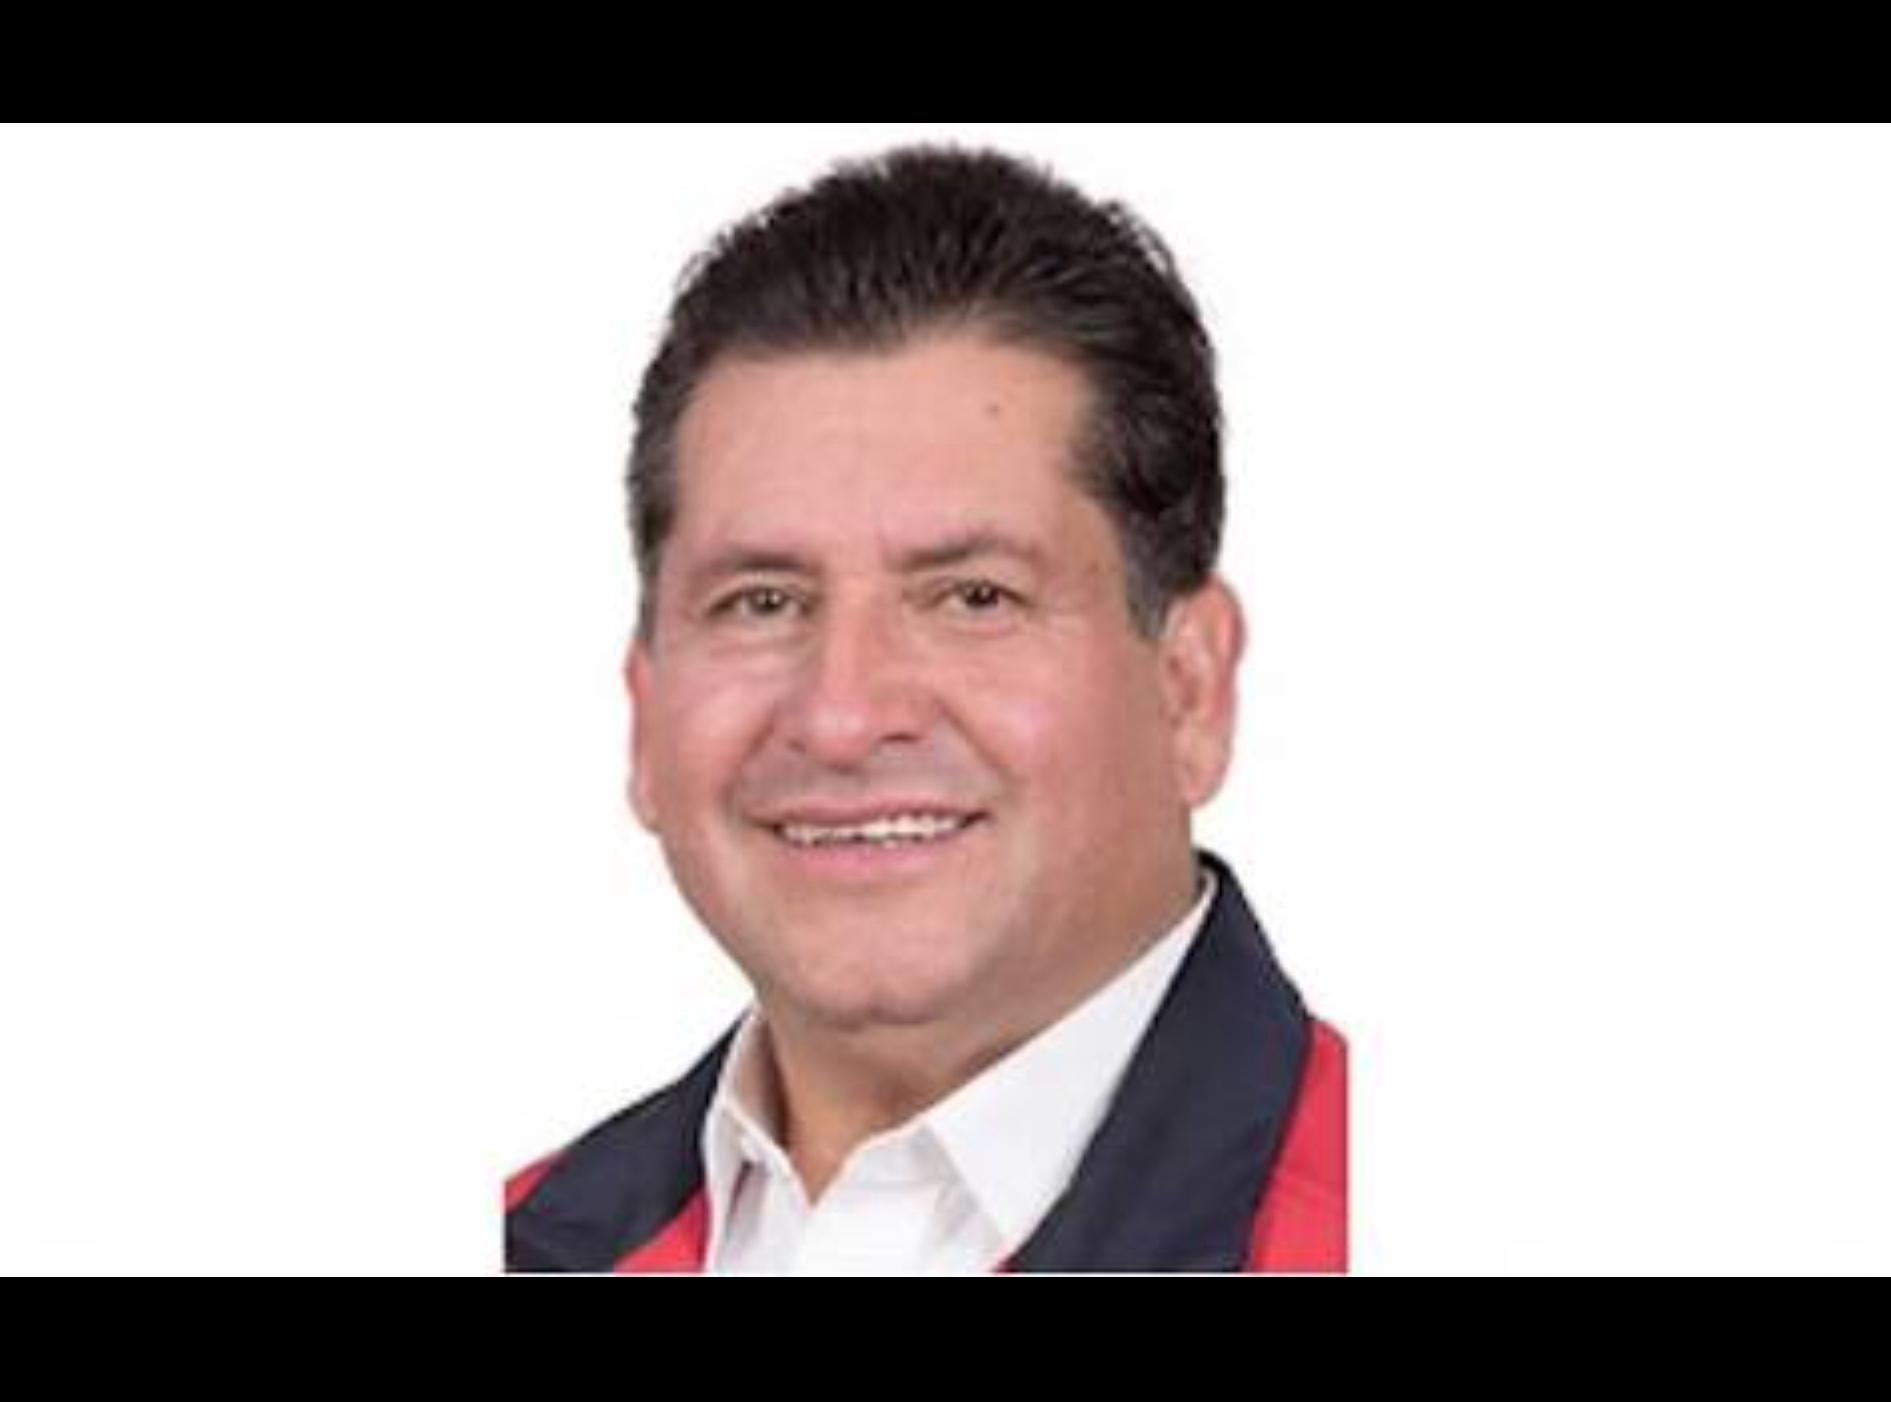 Asesinato de Rojas San Román aún es un misterio para FGJEM